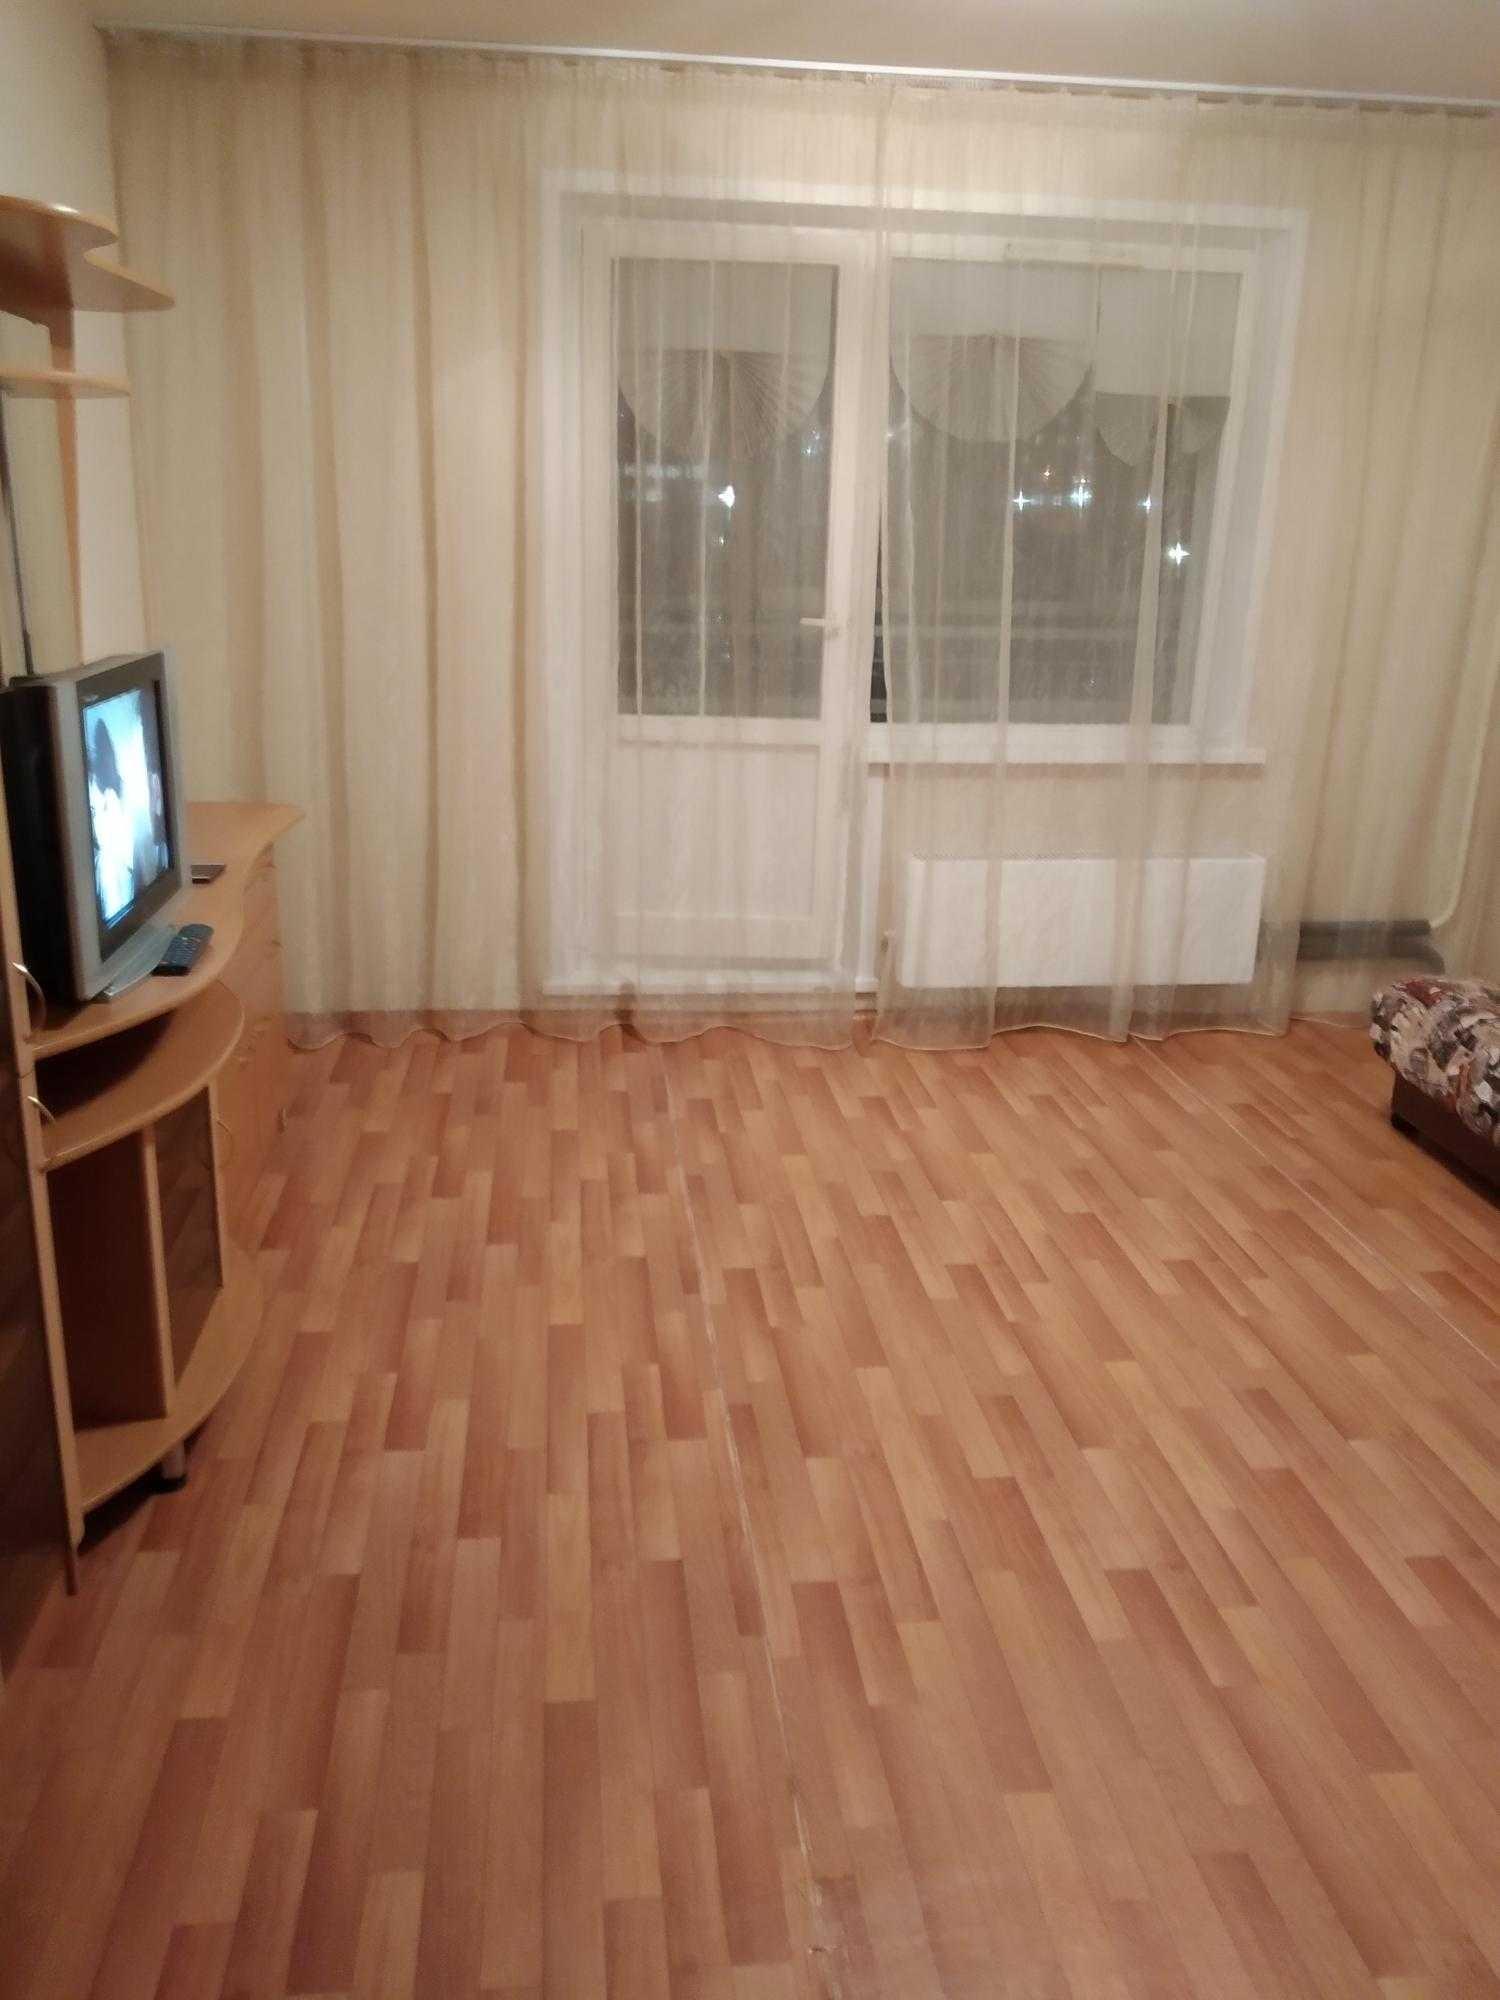 1к квартира улица Судостроительная, 145 | 15000 | аренда в Красноярске фото 1